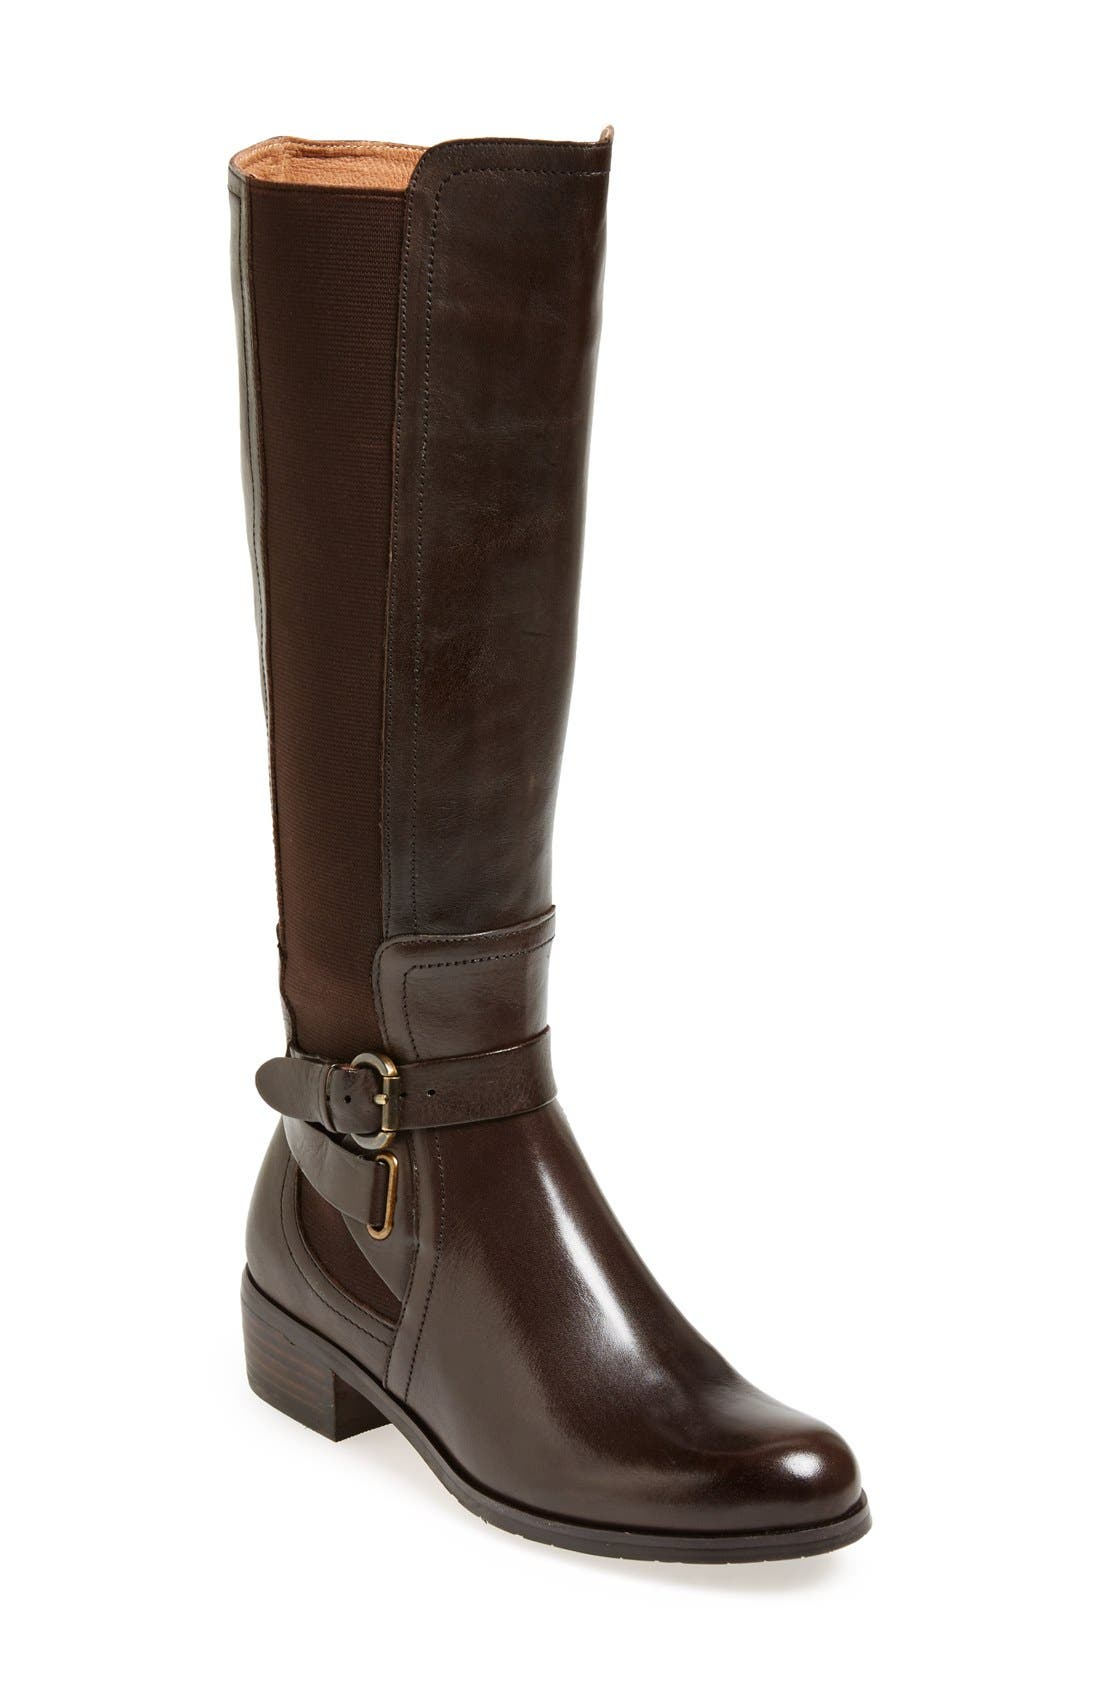 Alternate Image 1 Selected - Corso Como 'Baylee' Boot (Women)